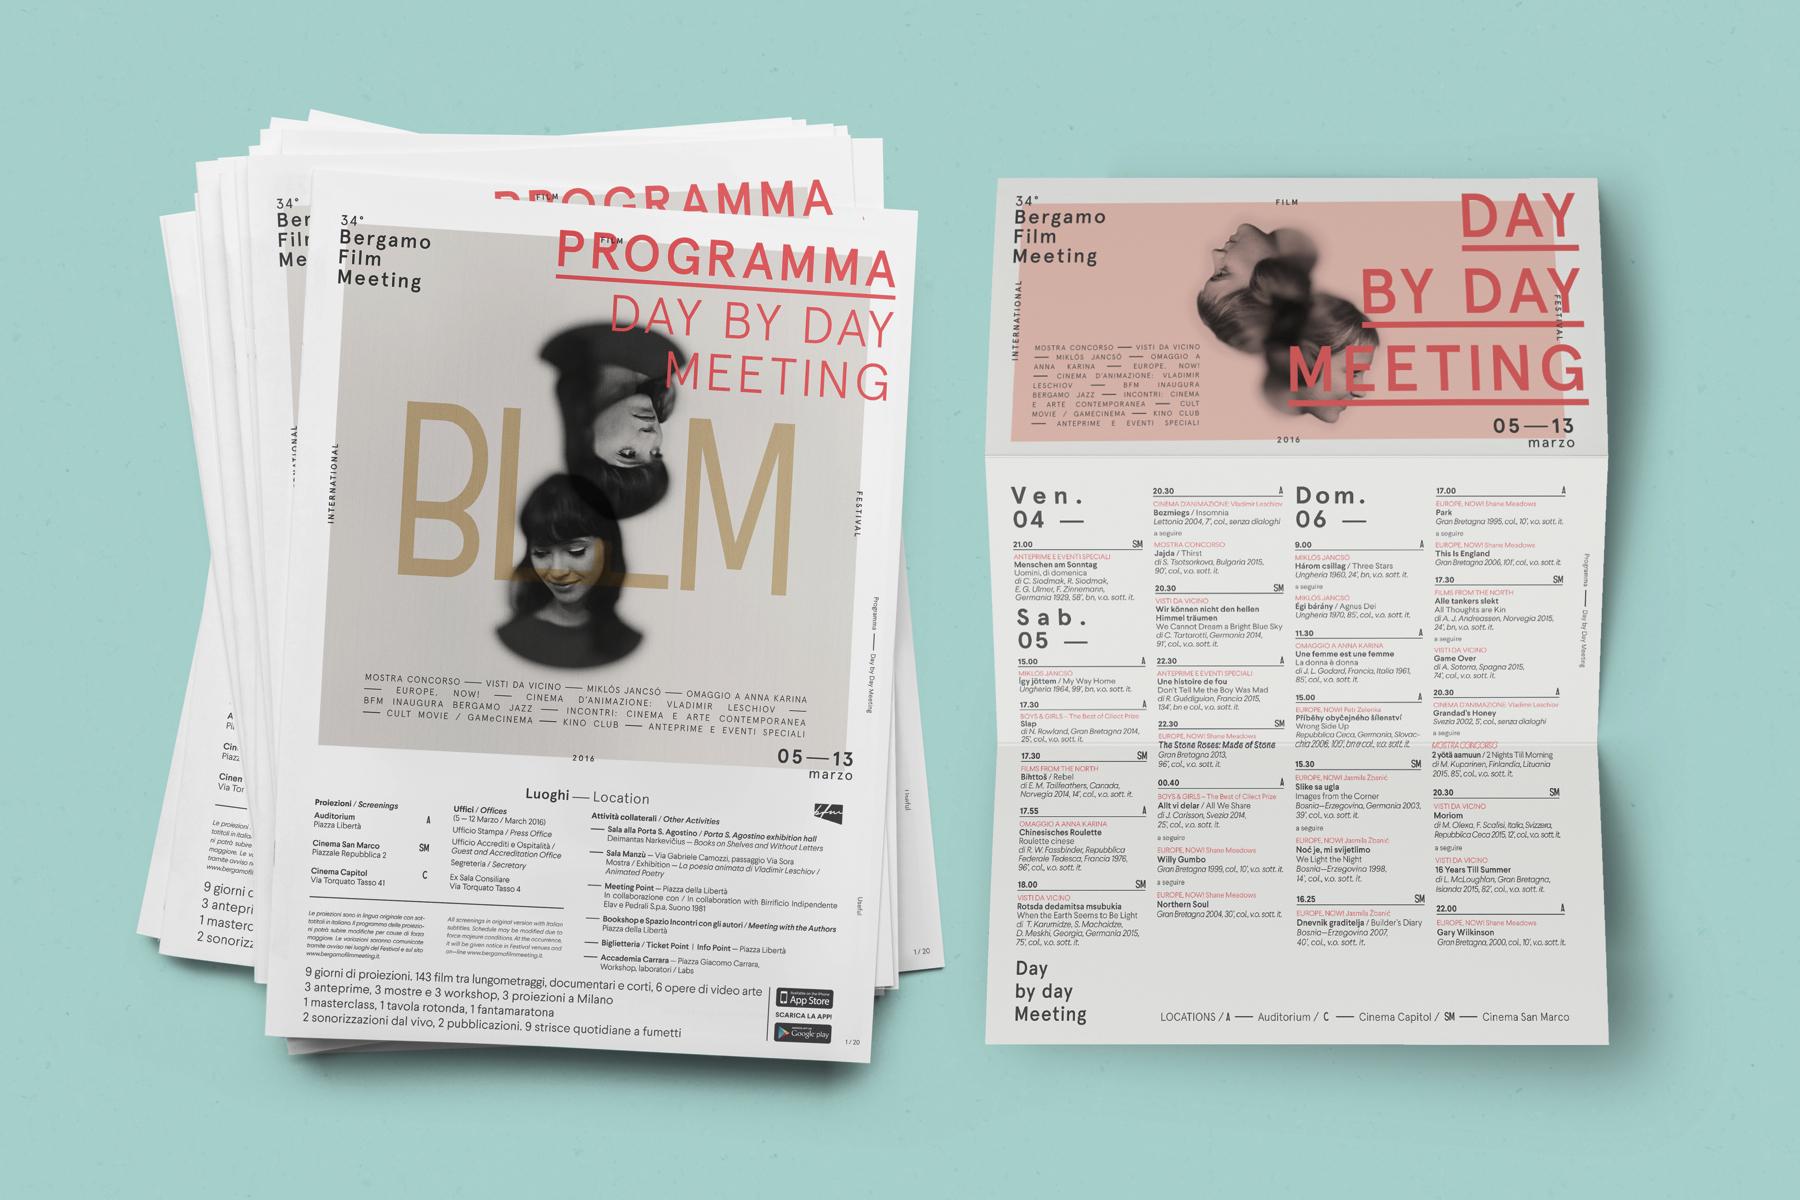 bfm34_programma_01b